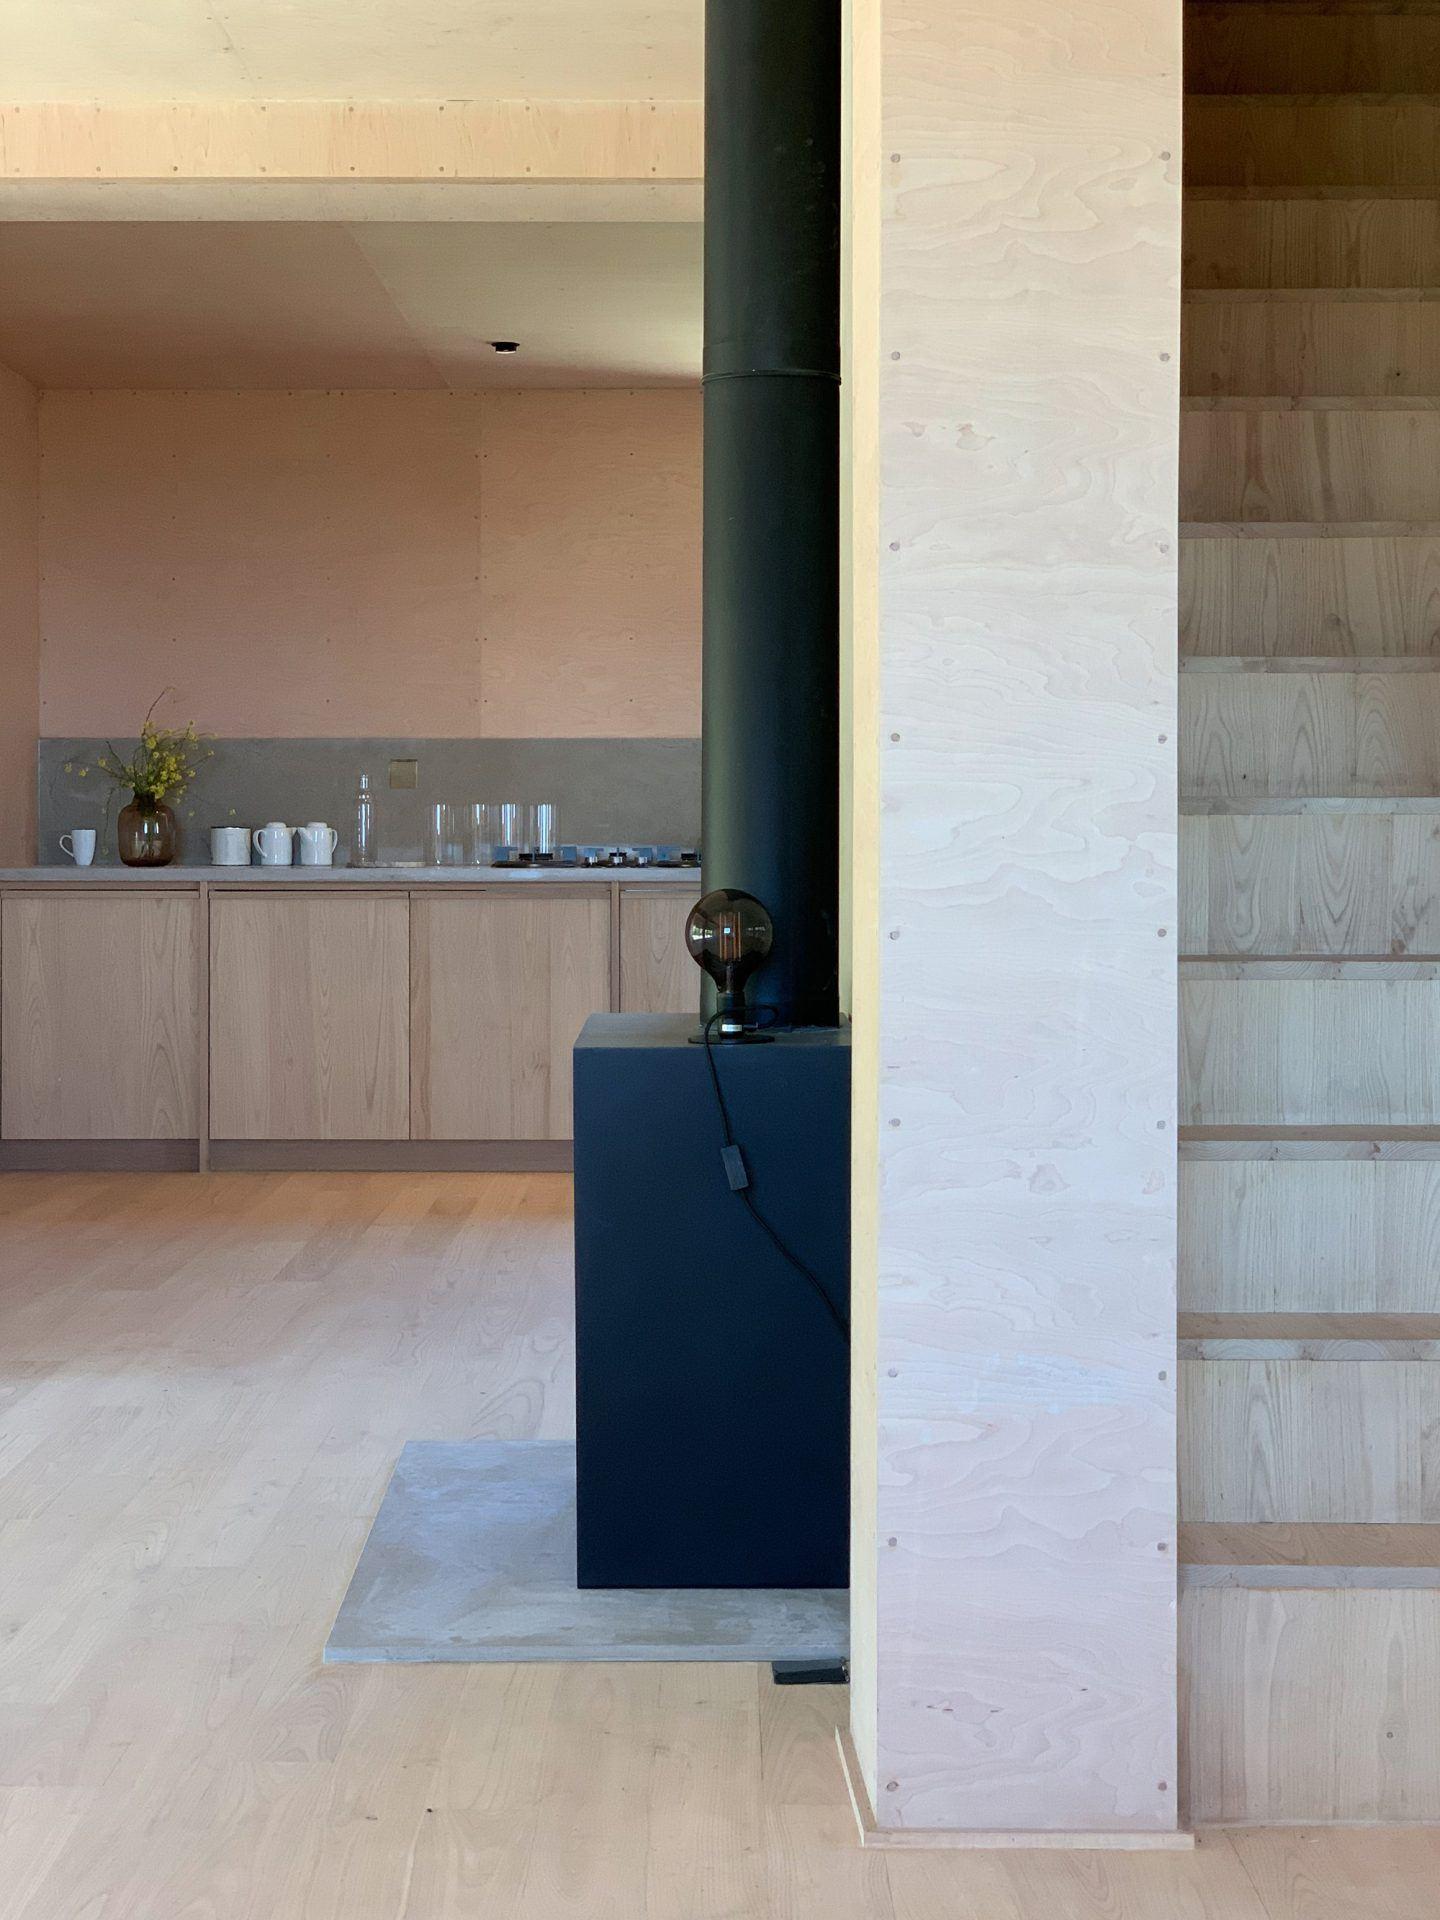 IGNANT-Architecture-Studio-Combo-Houses-Etosoto-10